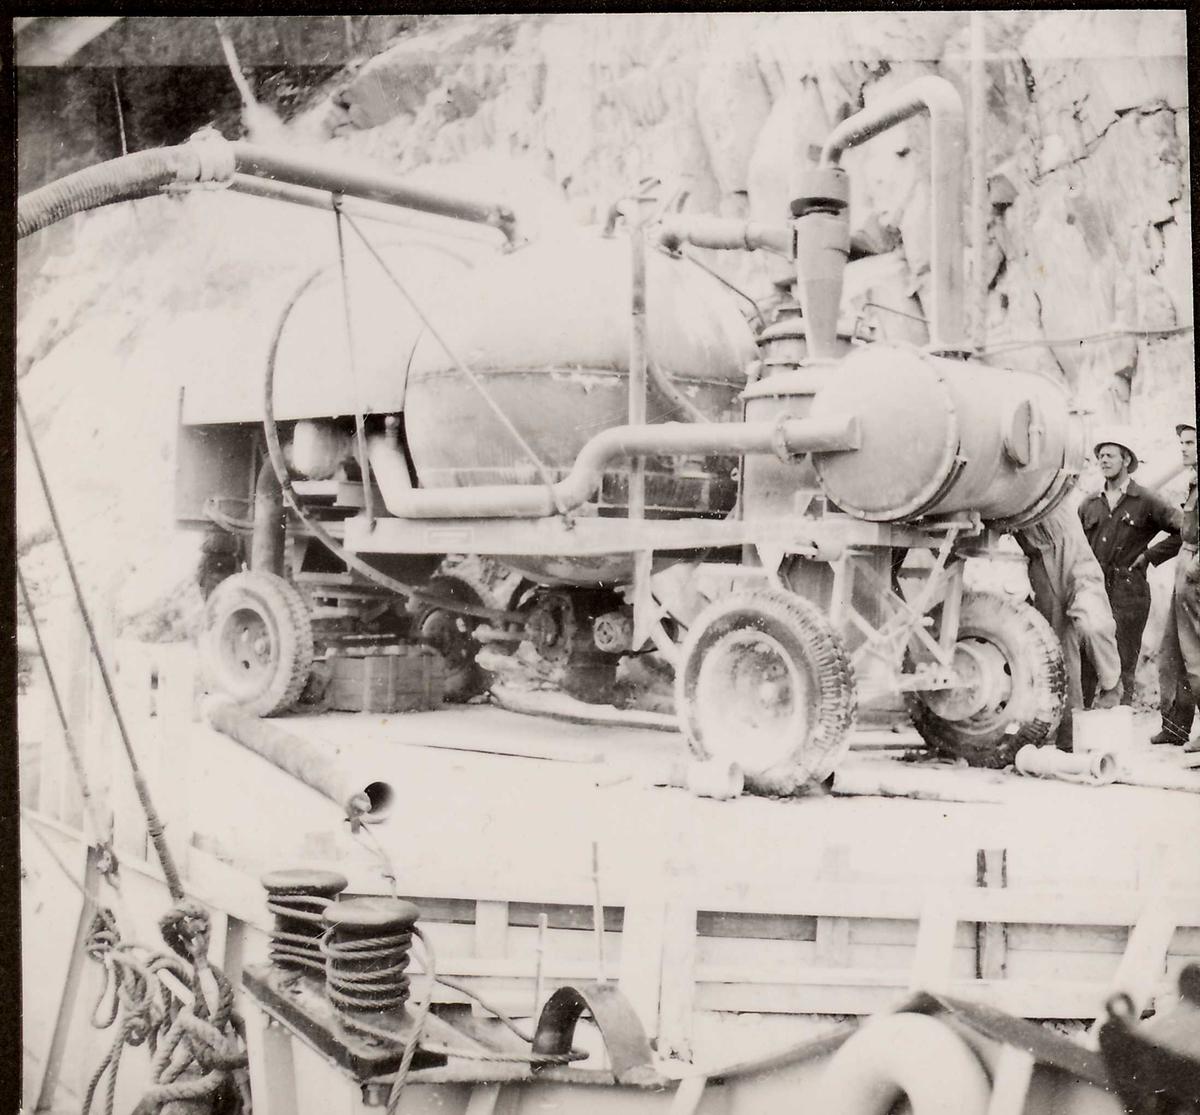 Dalen, betong 4, juni 58